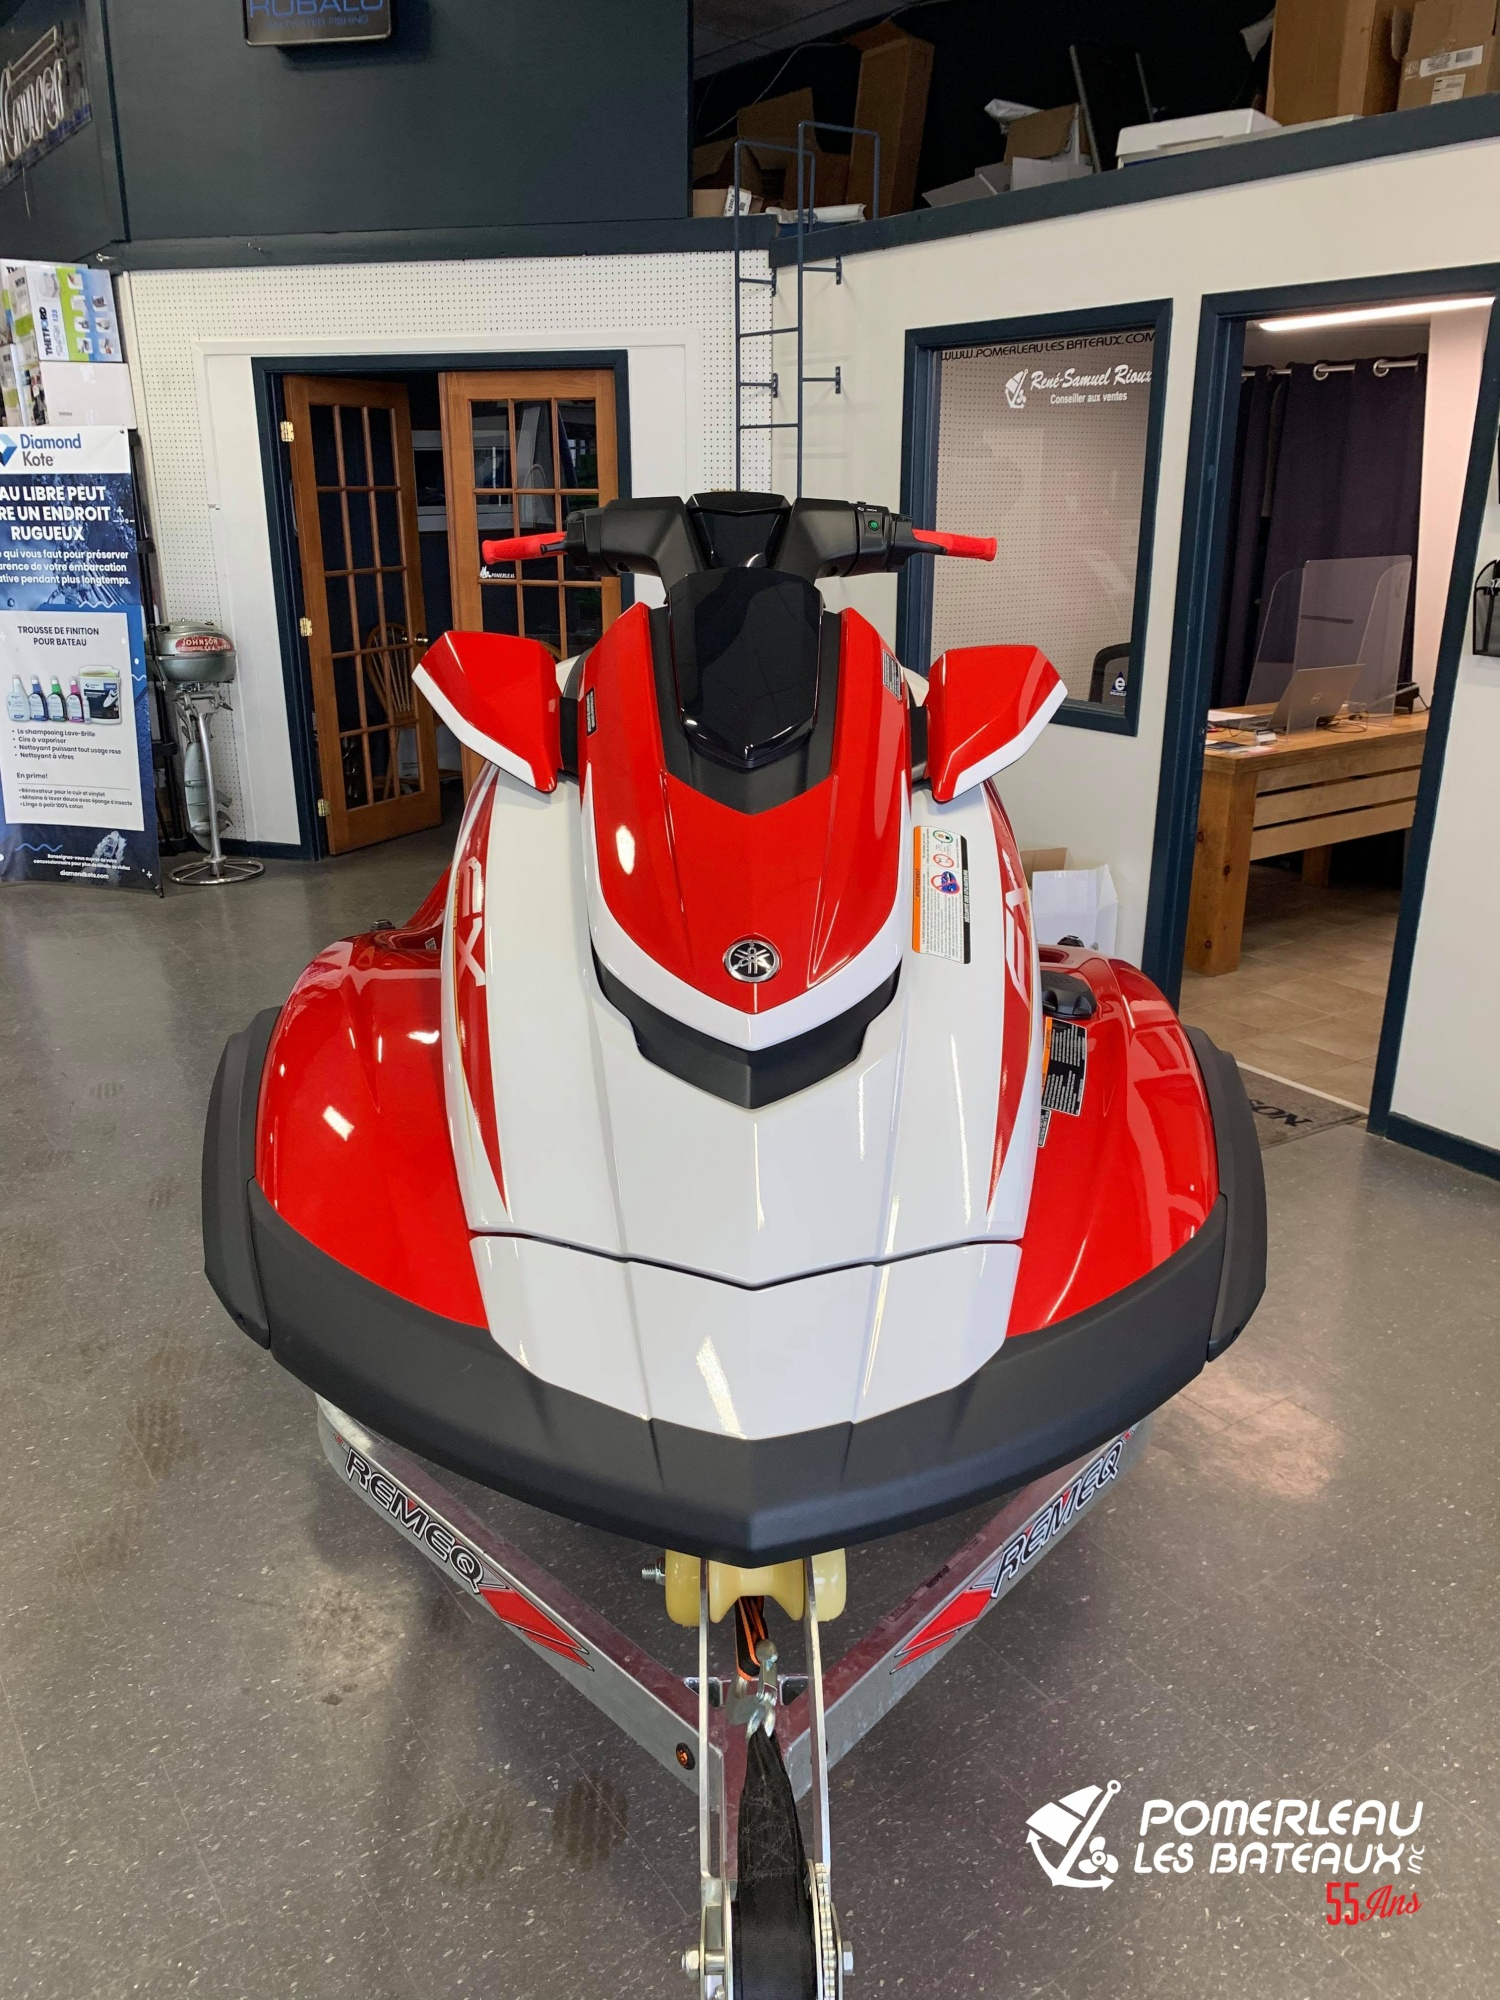 Yamaha FX Cruiser SVHO - 240136039_1466799593691216_337918375846852277_n.jpeg